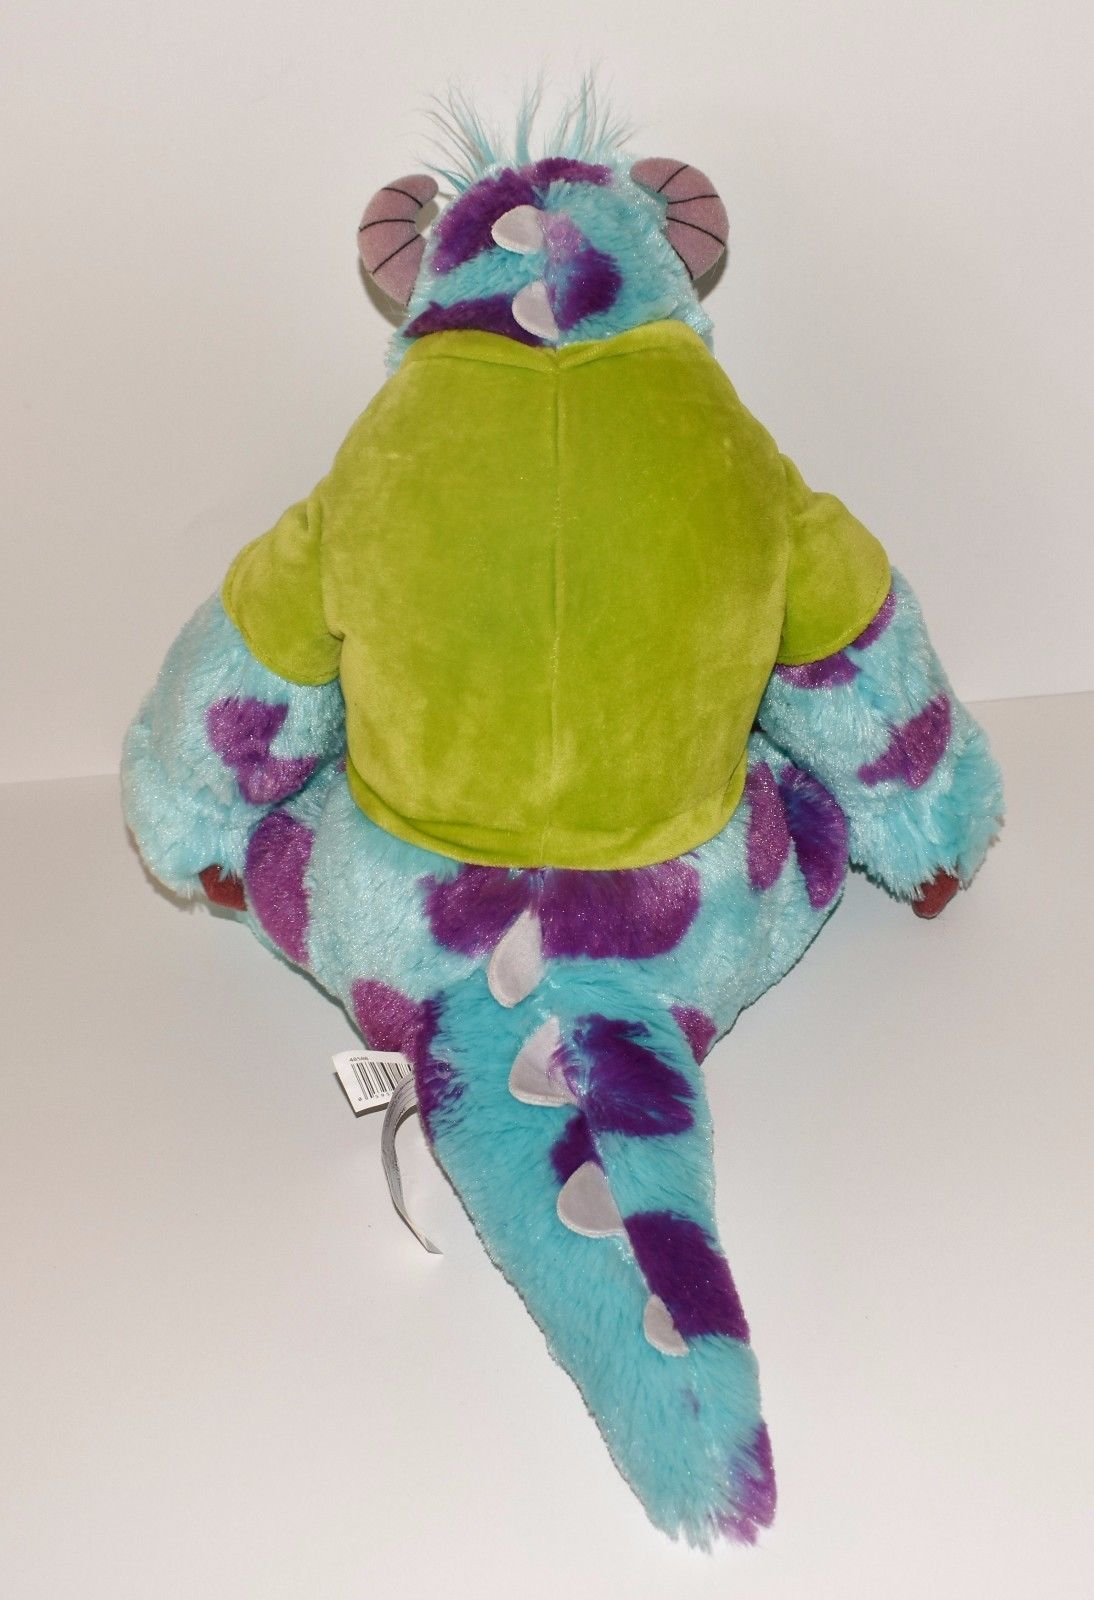 "New Plush Disney Pixar Monsters University Sulley Oozma Kappa Green Shirt 12"""